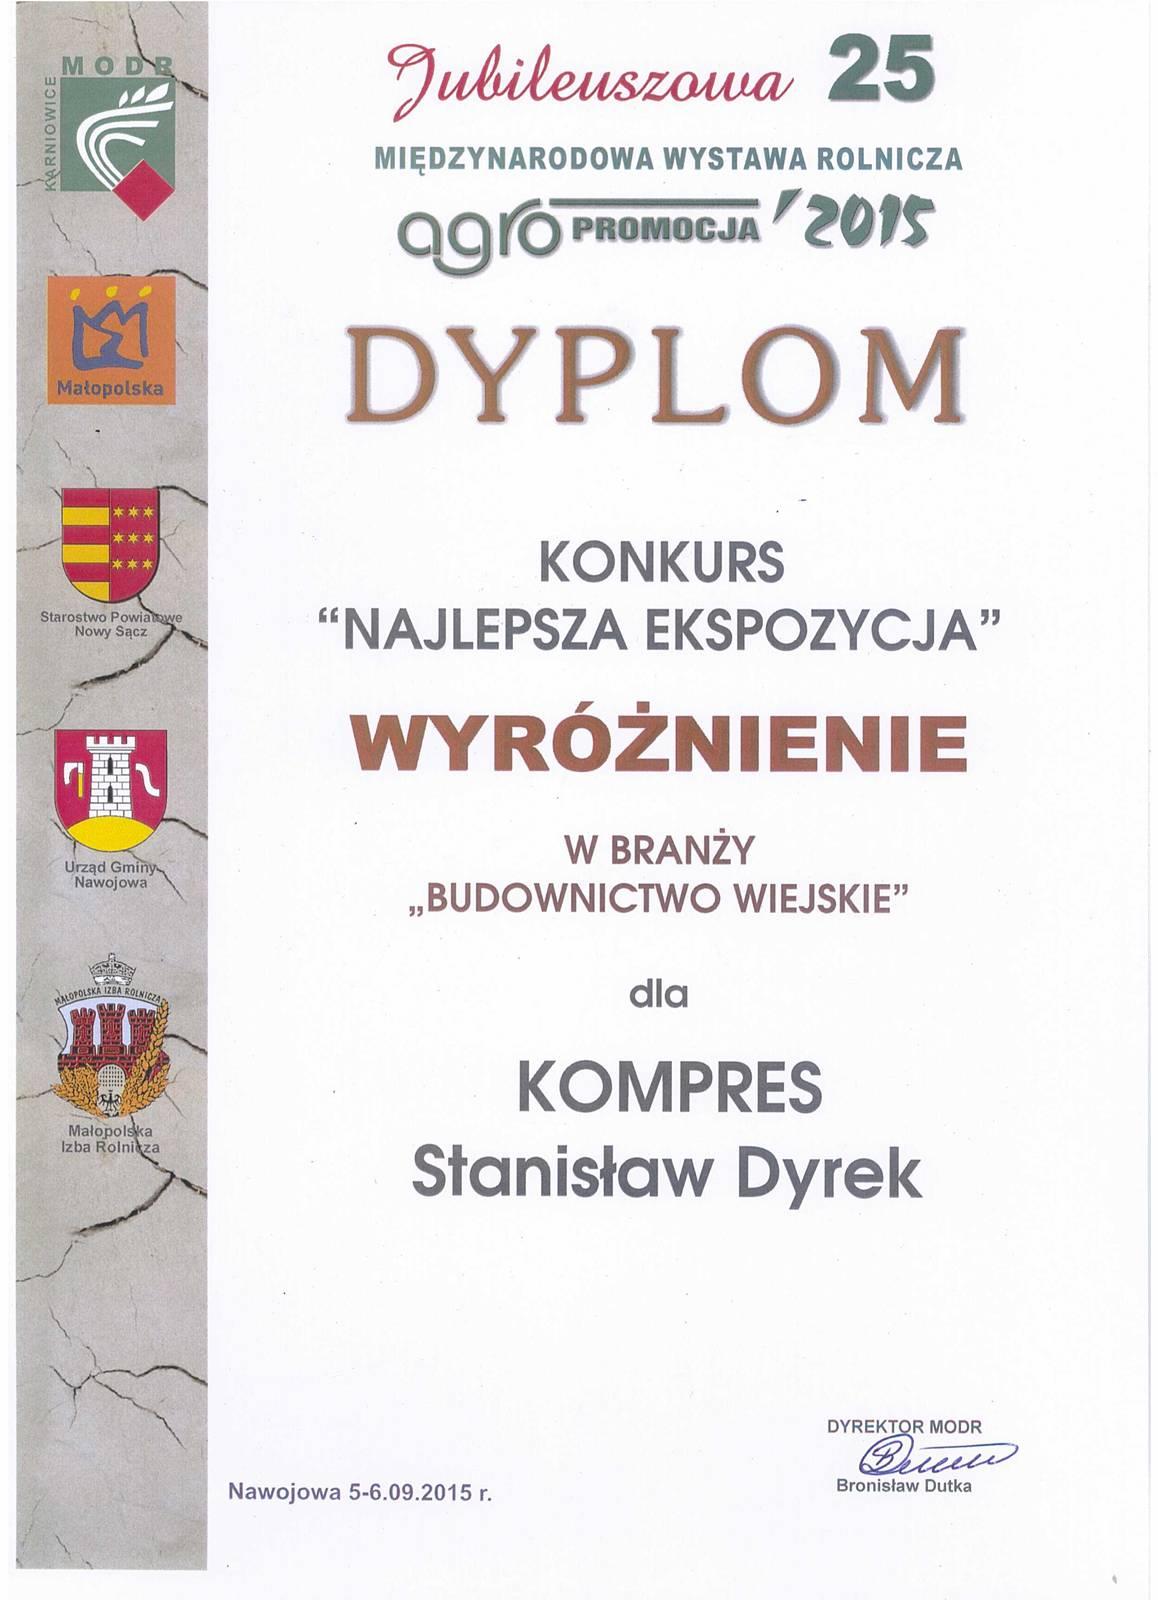 Dyplom 2015